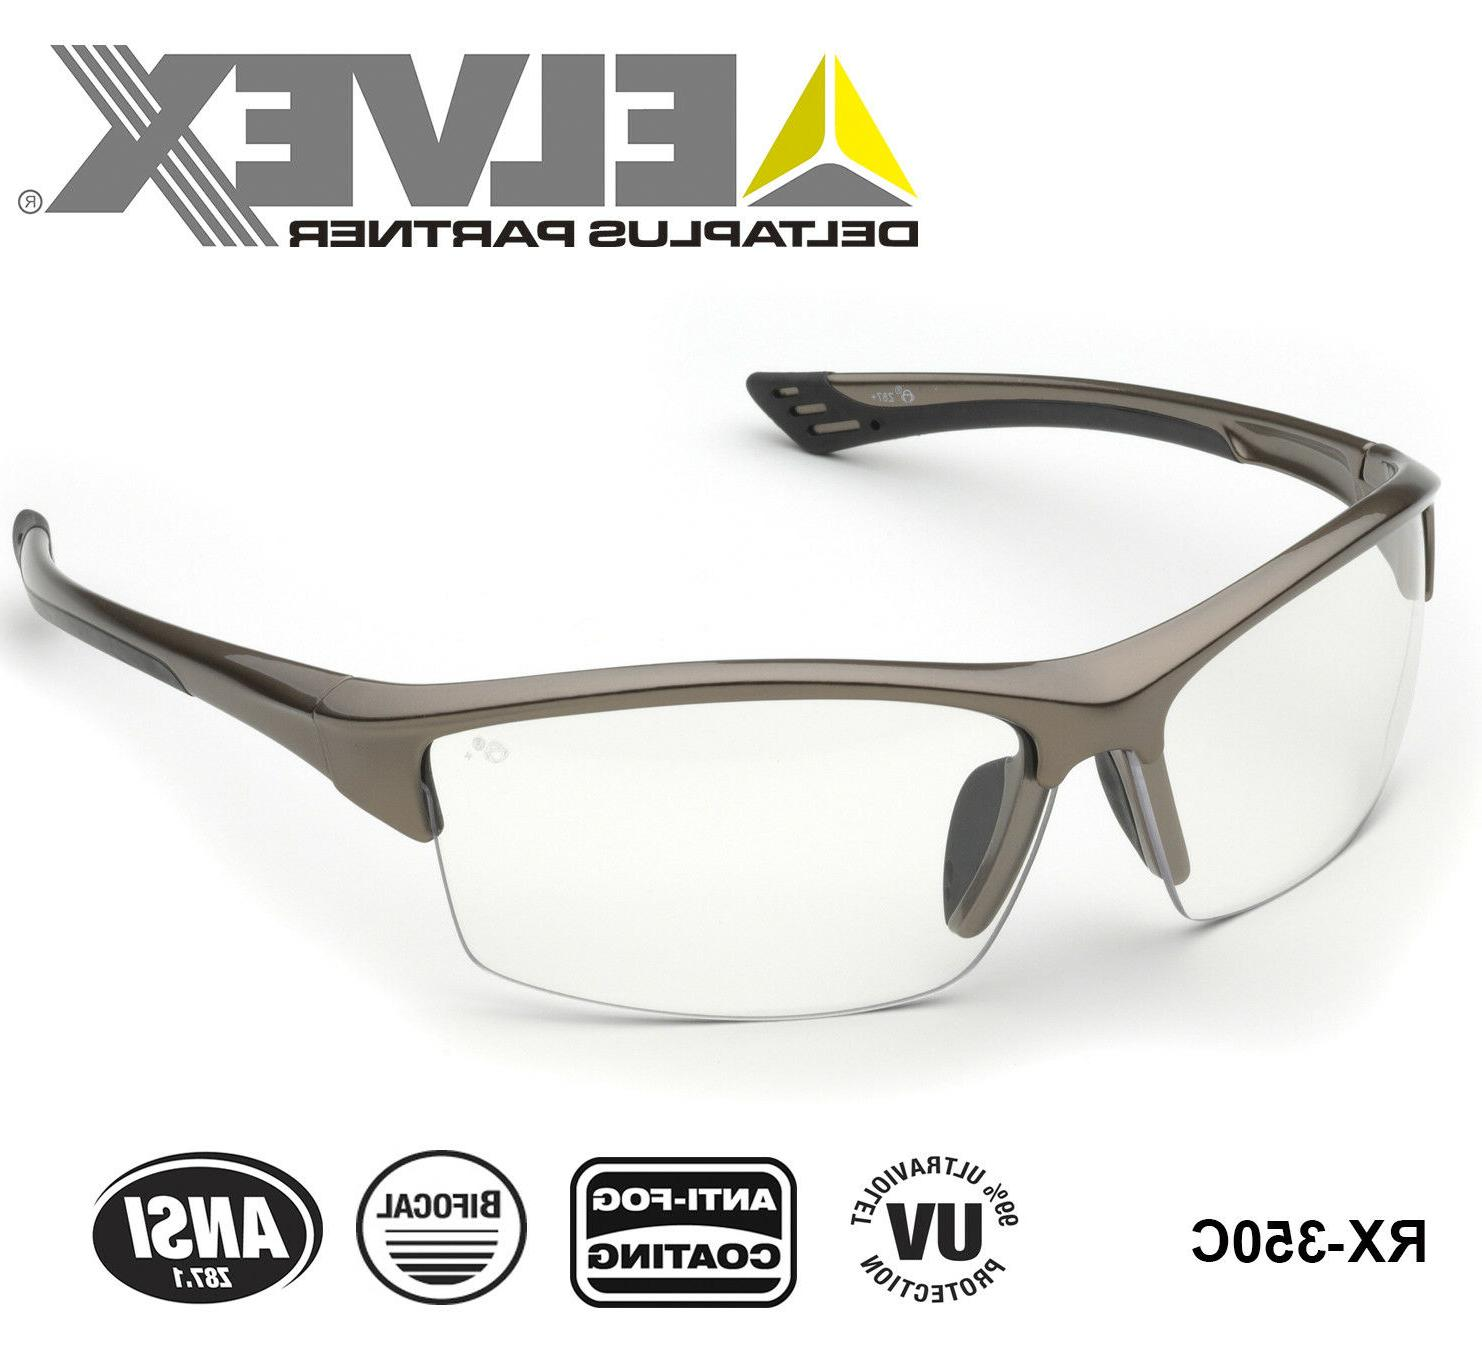 Elvex Bifocal Safety Metallic Brown Frame/Clear Lens